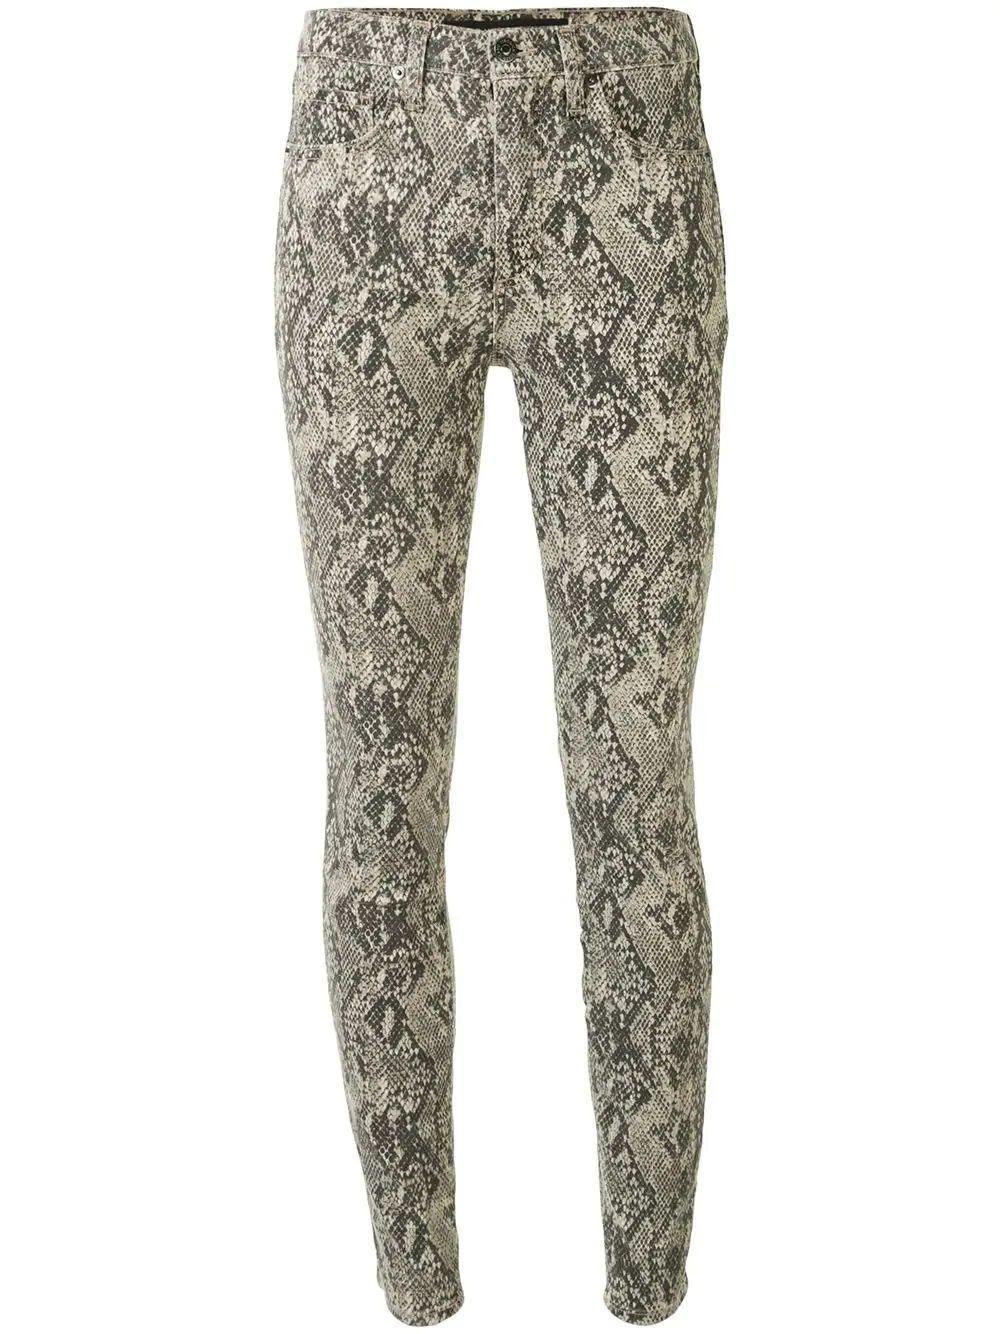 Kate Python Print High Rise Skinny Jean Item # J20014330426SN